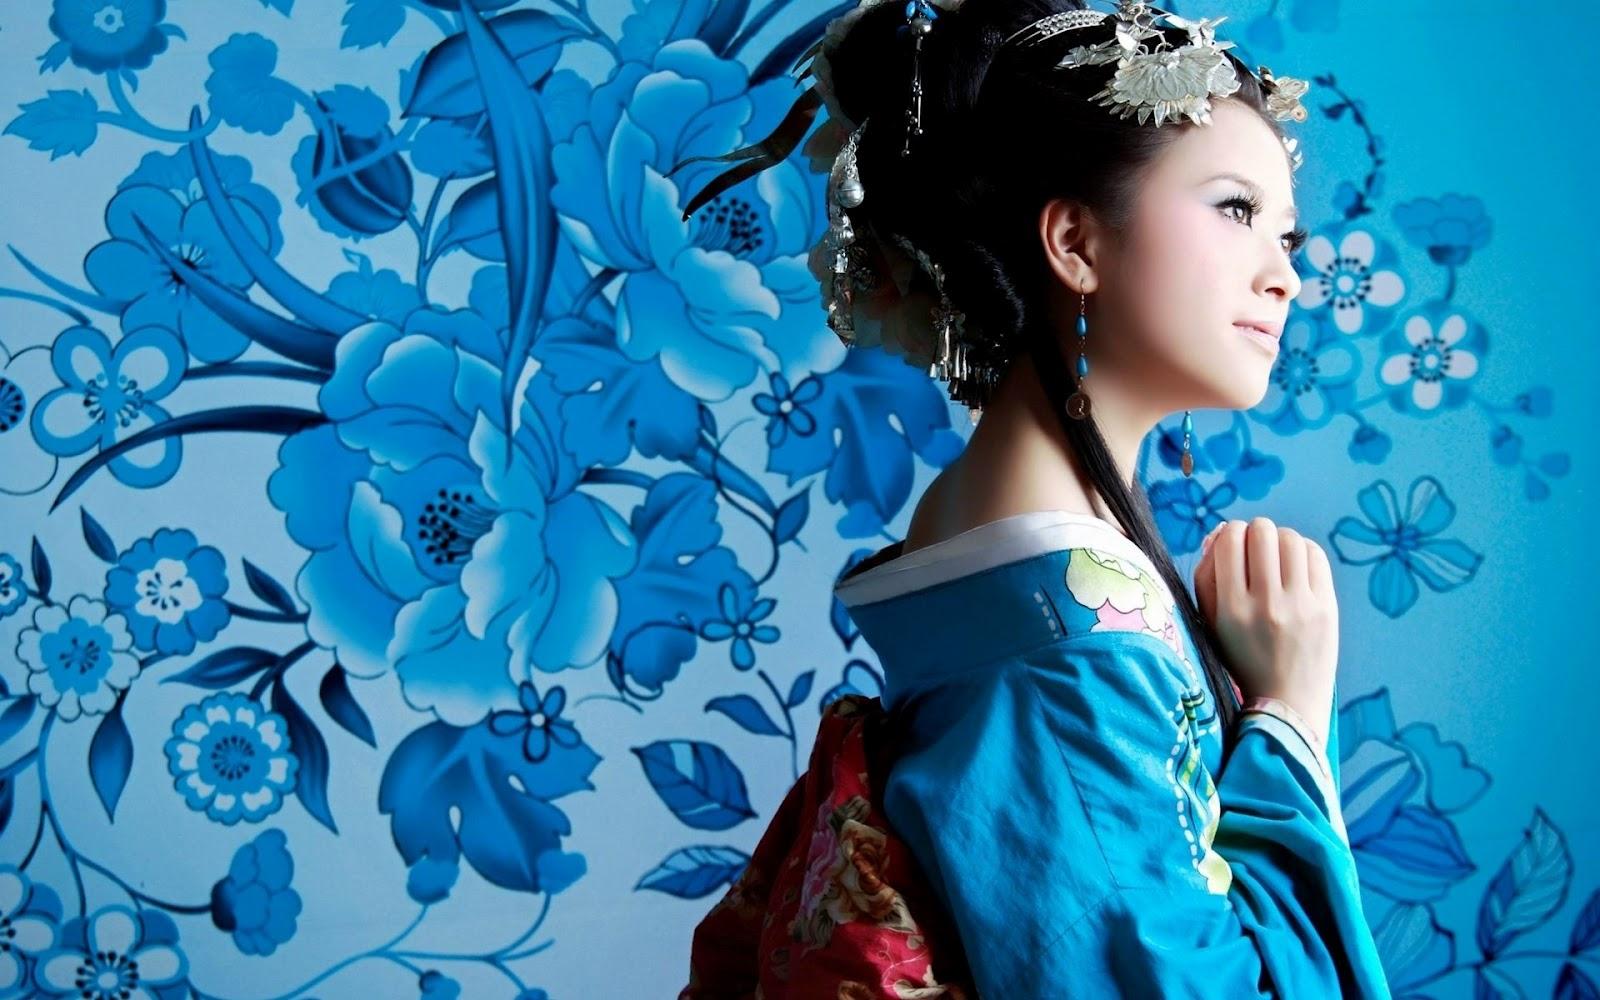 Aritsuy Atko: Japanese Kimono Wallpaper